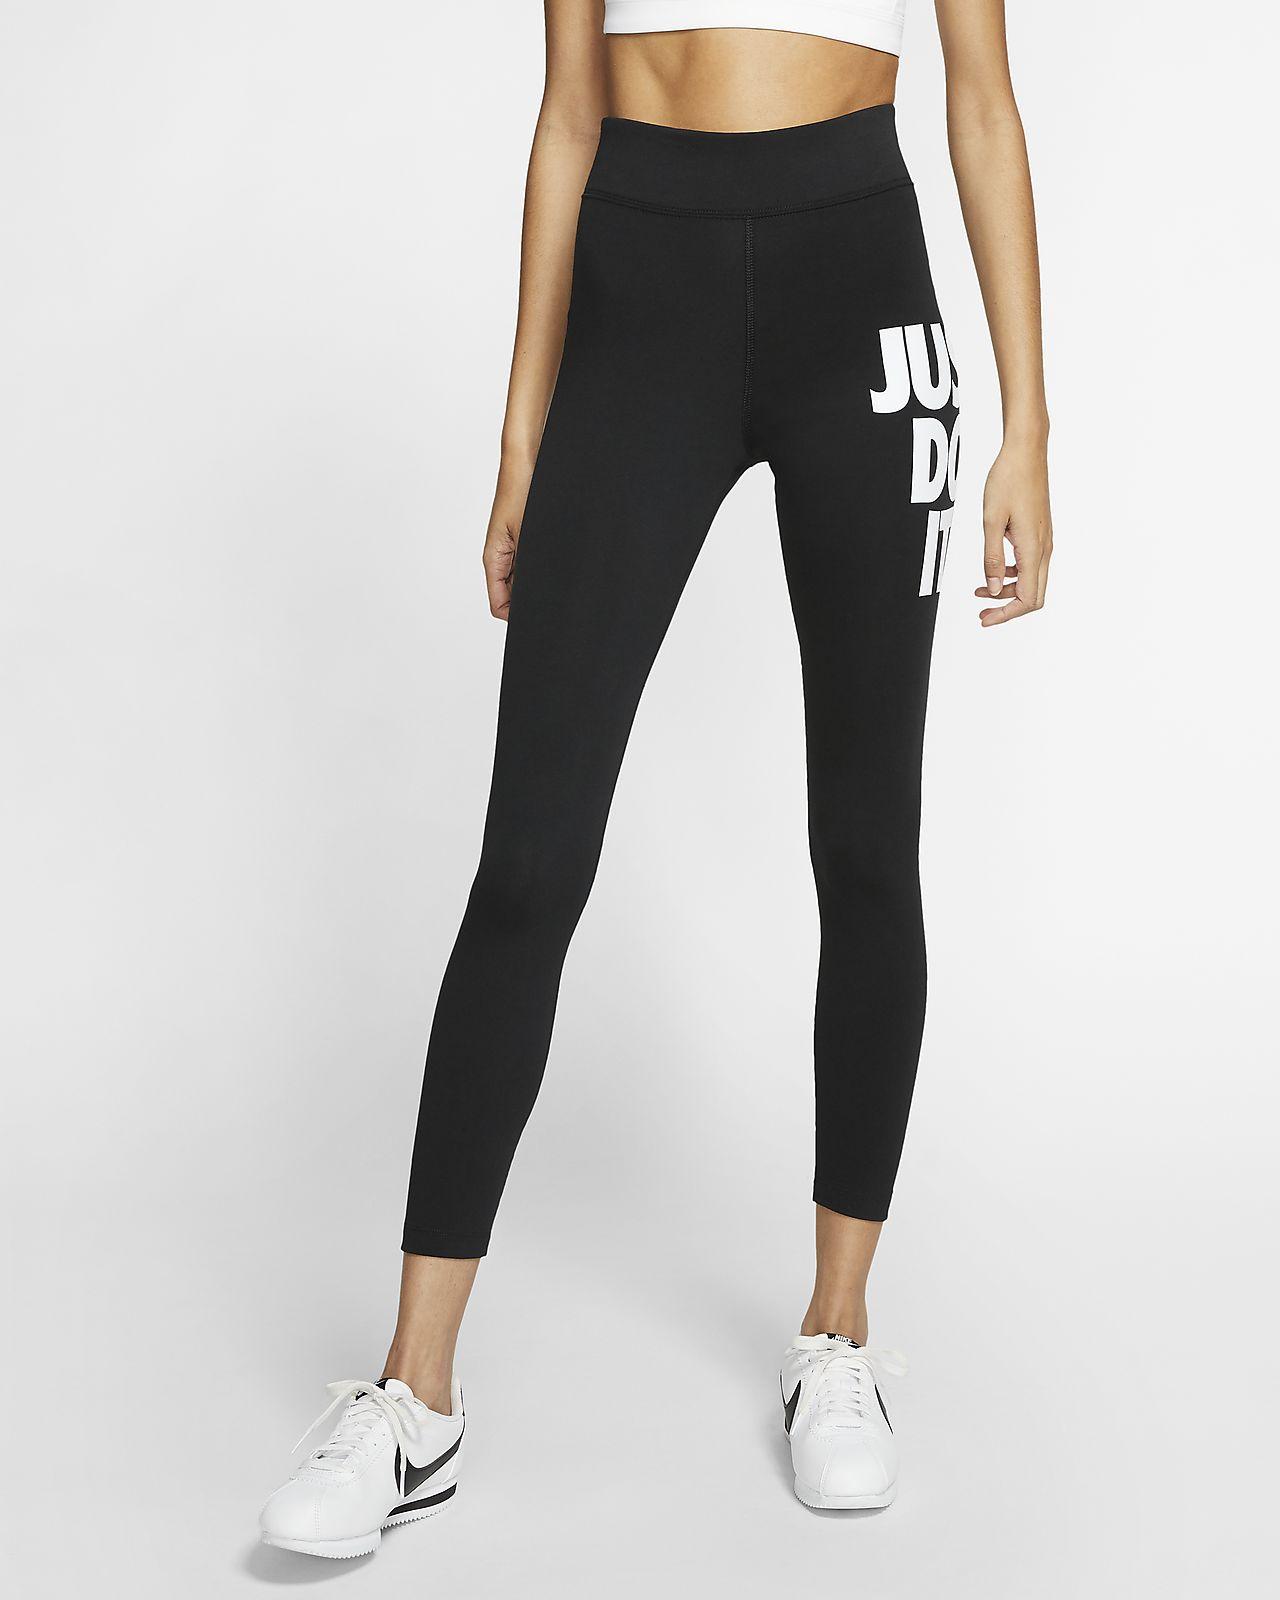 Leggings a 78 Nike Sportswear Leg A See JDI Donna